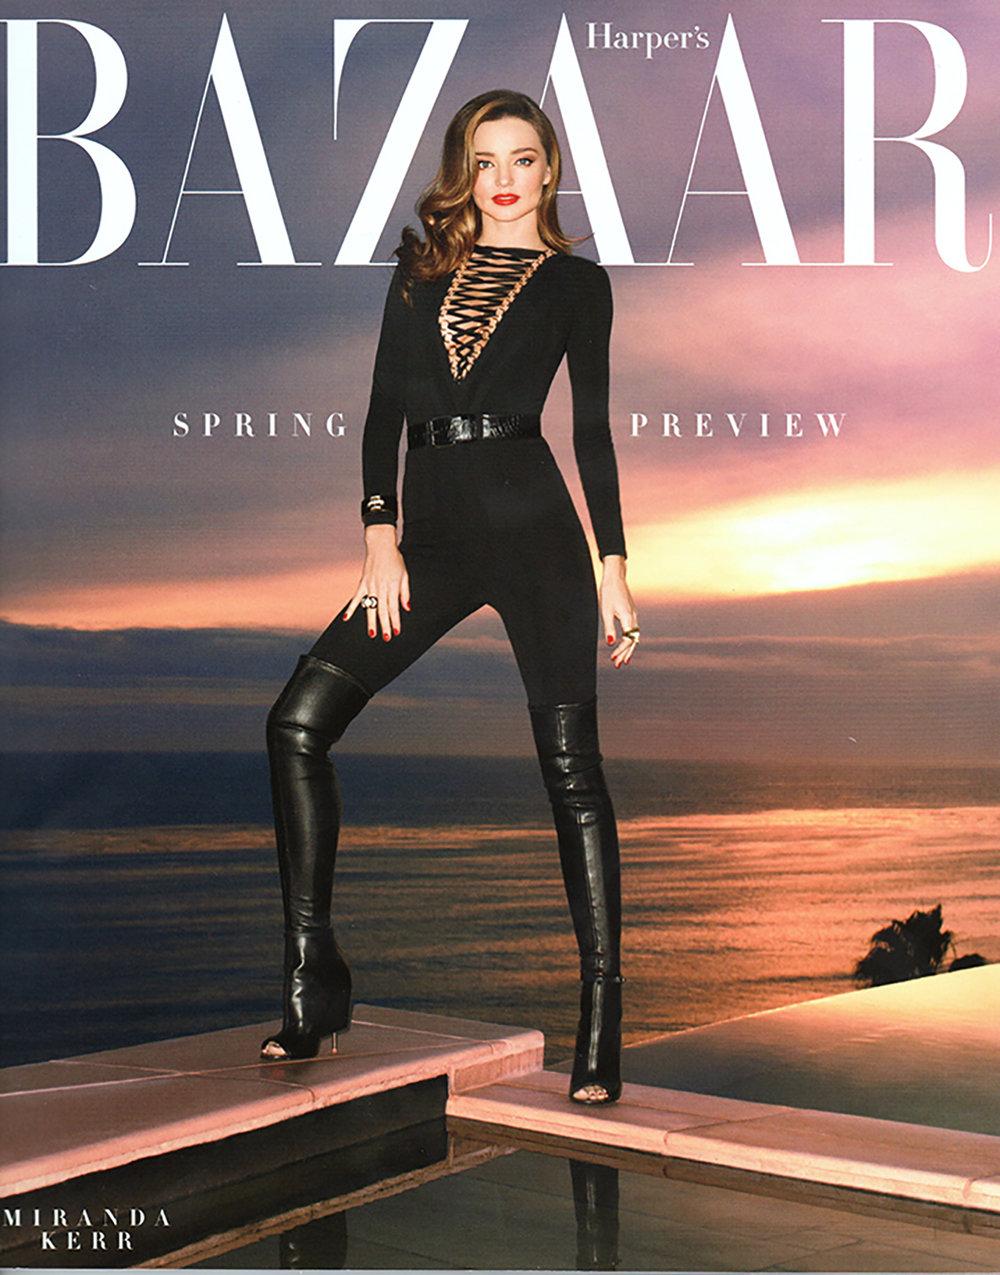 Bazaar - 1 - February 2015.jpg